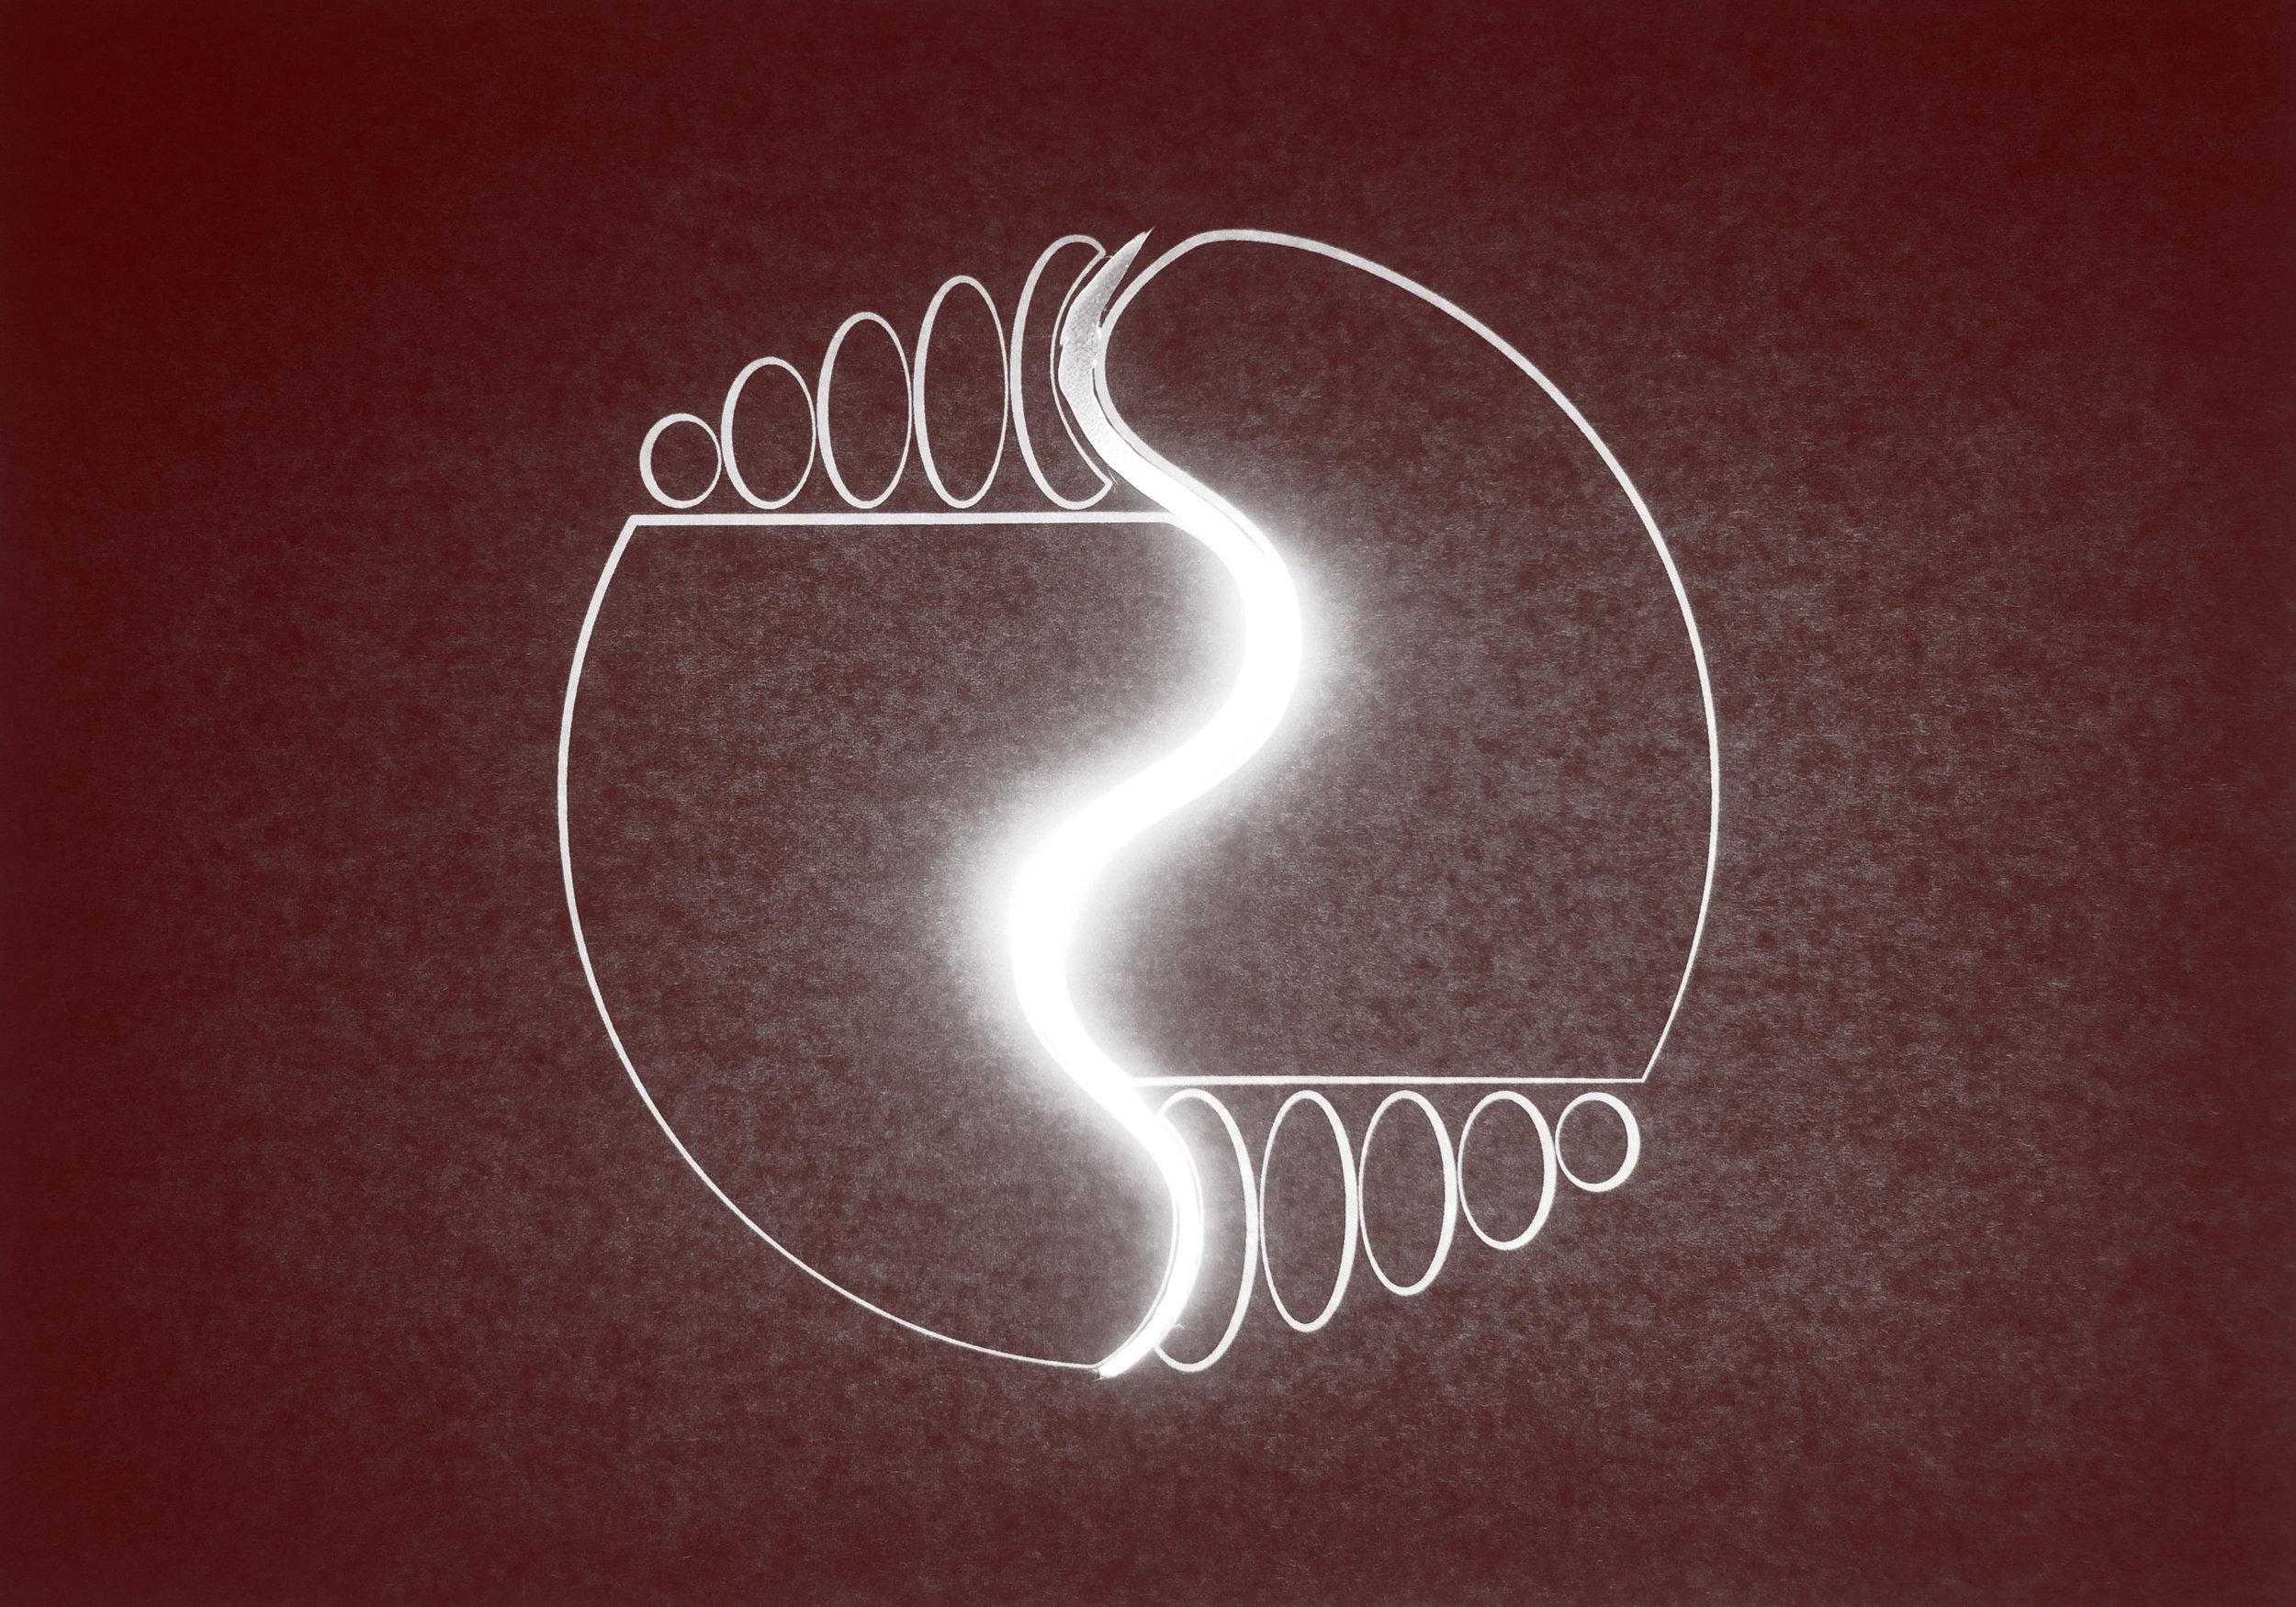 INTEGRATION - MINI WORKSHOP // AMSTERDAM25 August 09:30 - 13:30